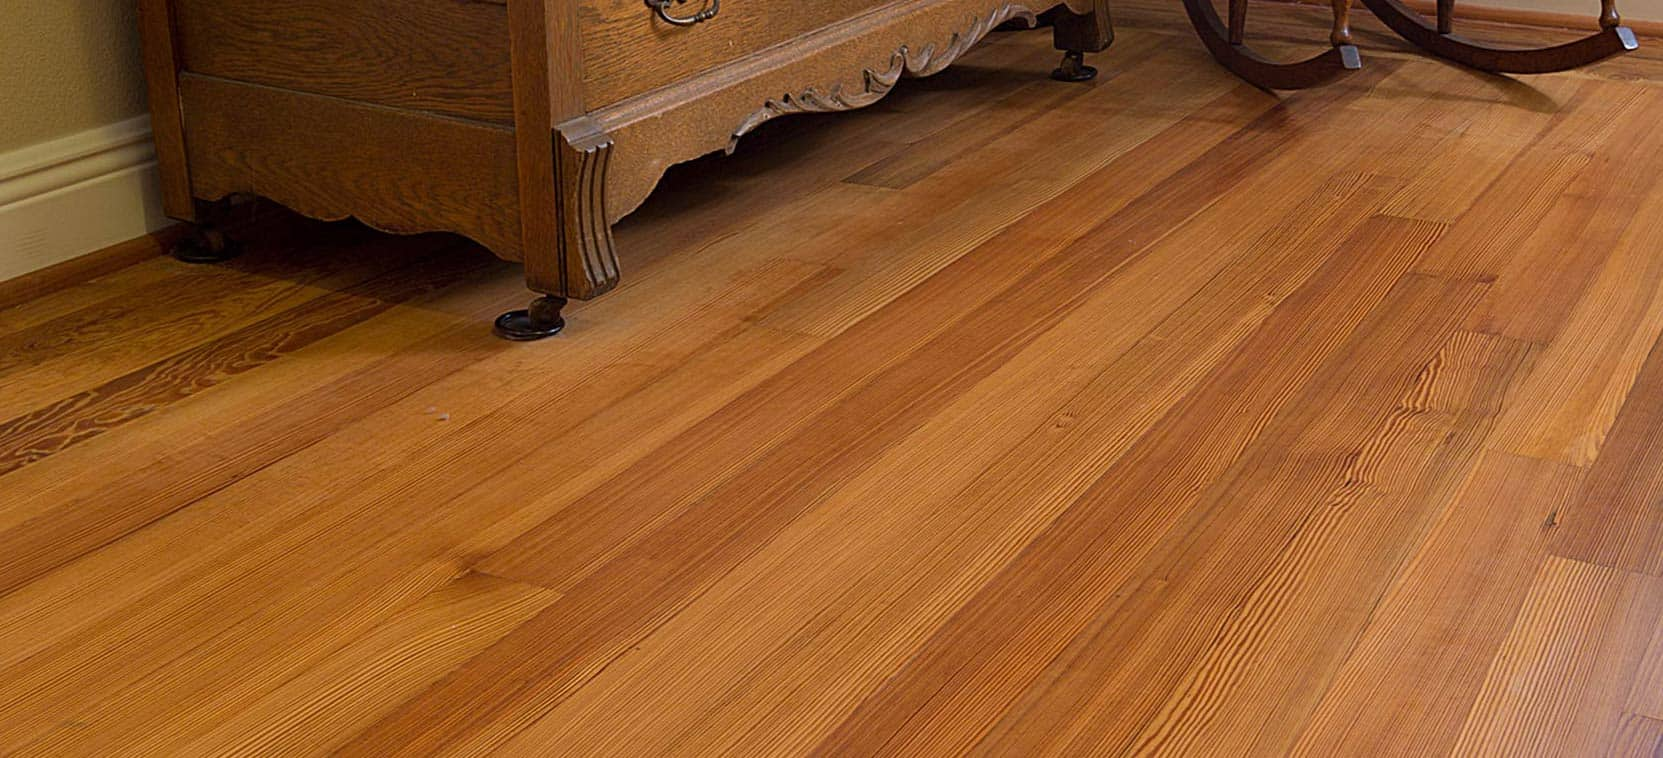 Heart Pine Reclaimed Wood Flooring Goodwin Company